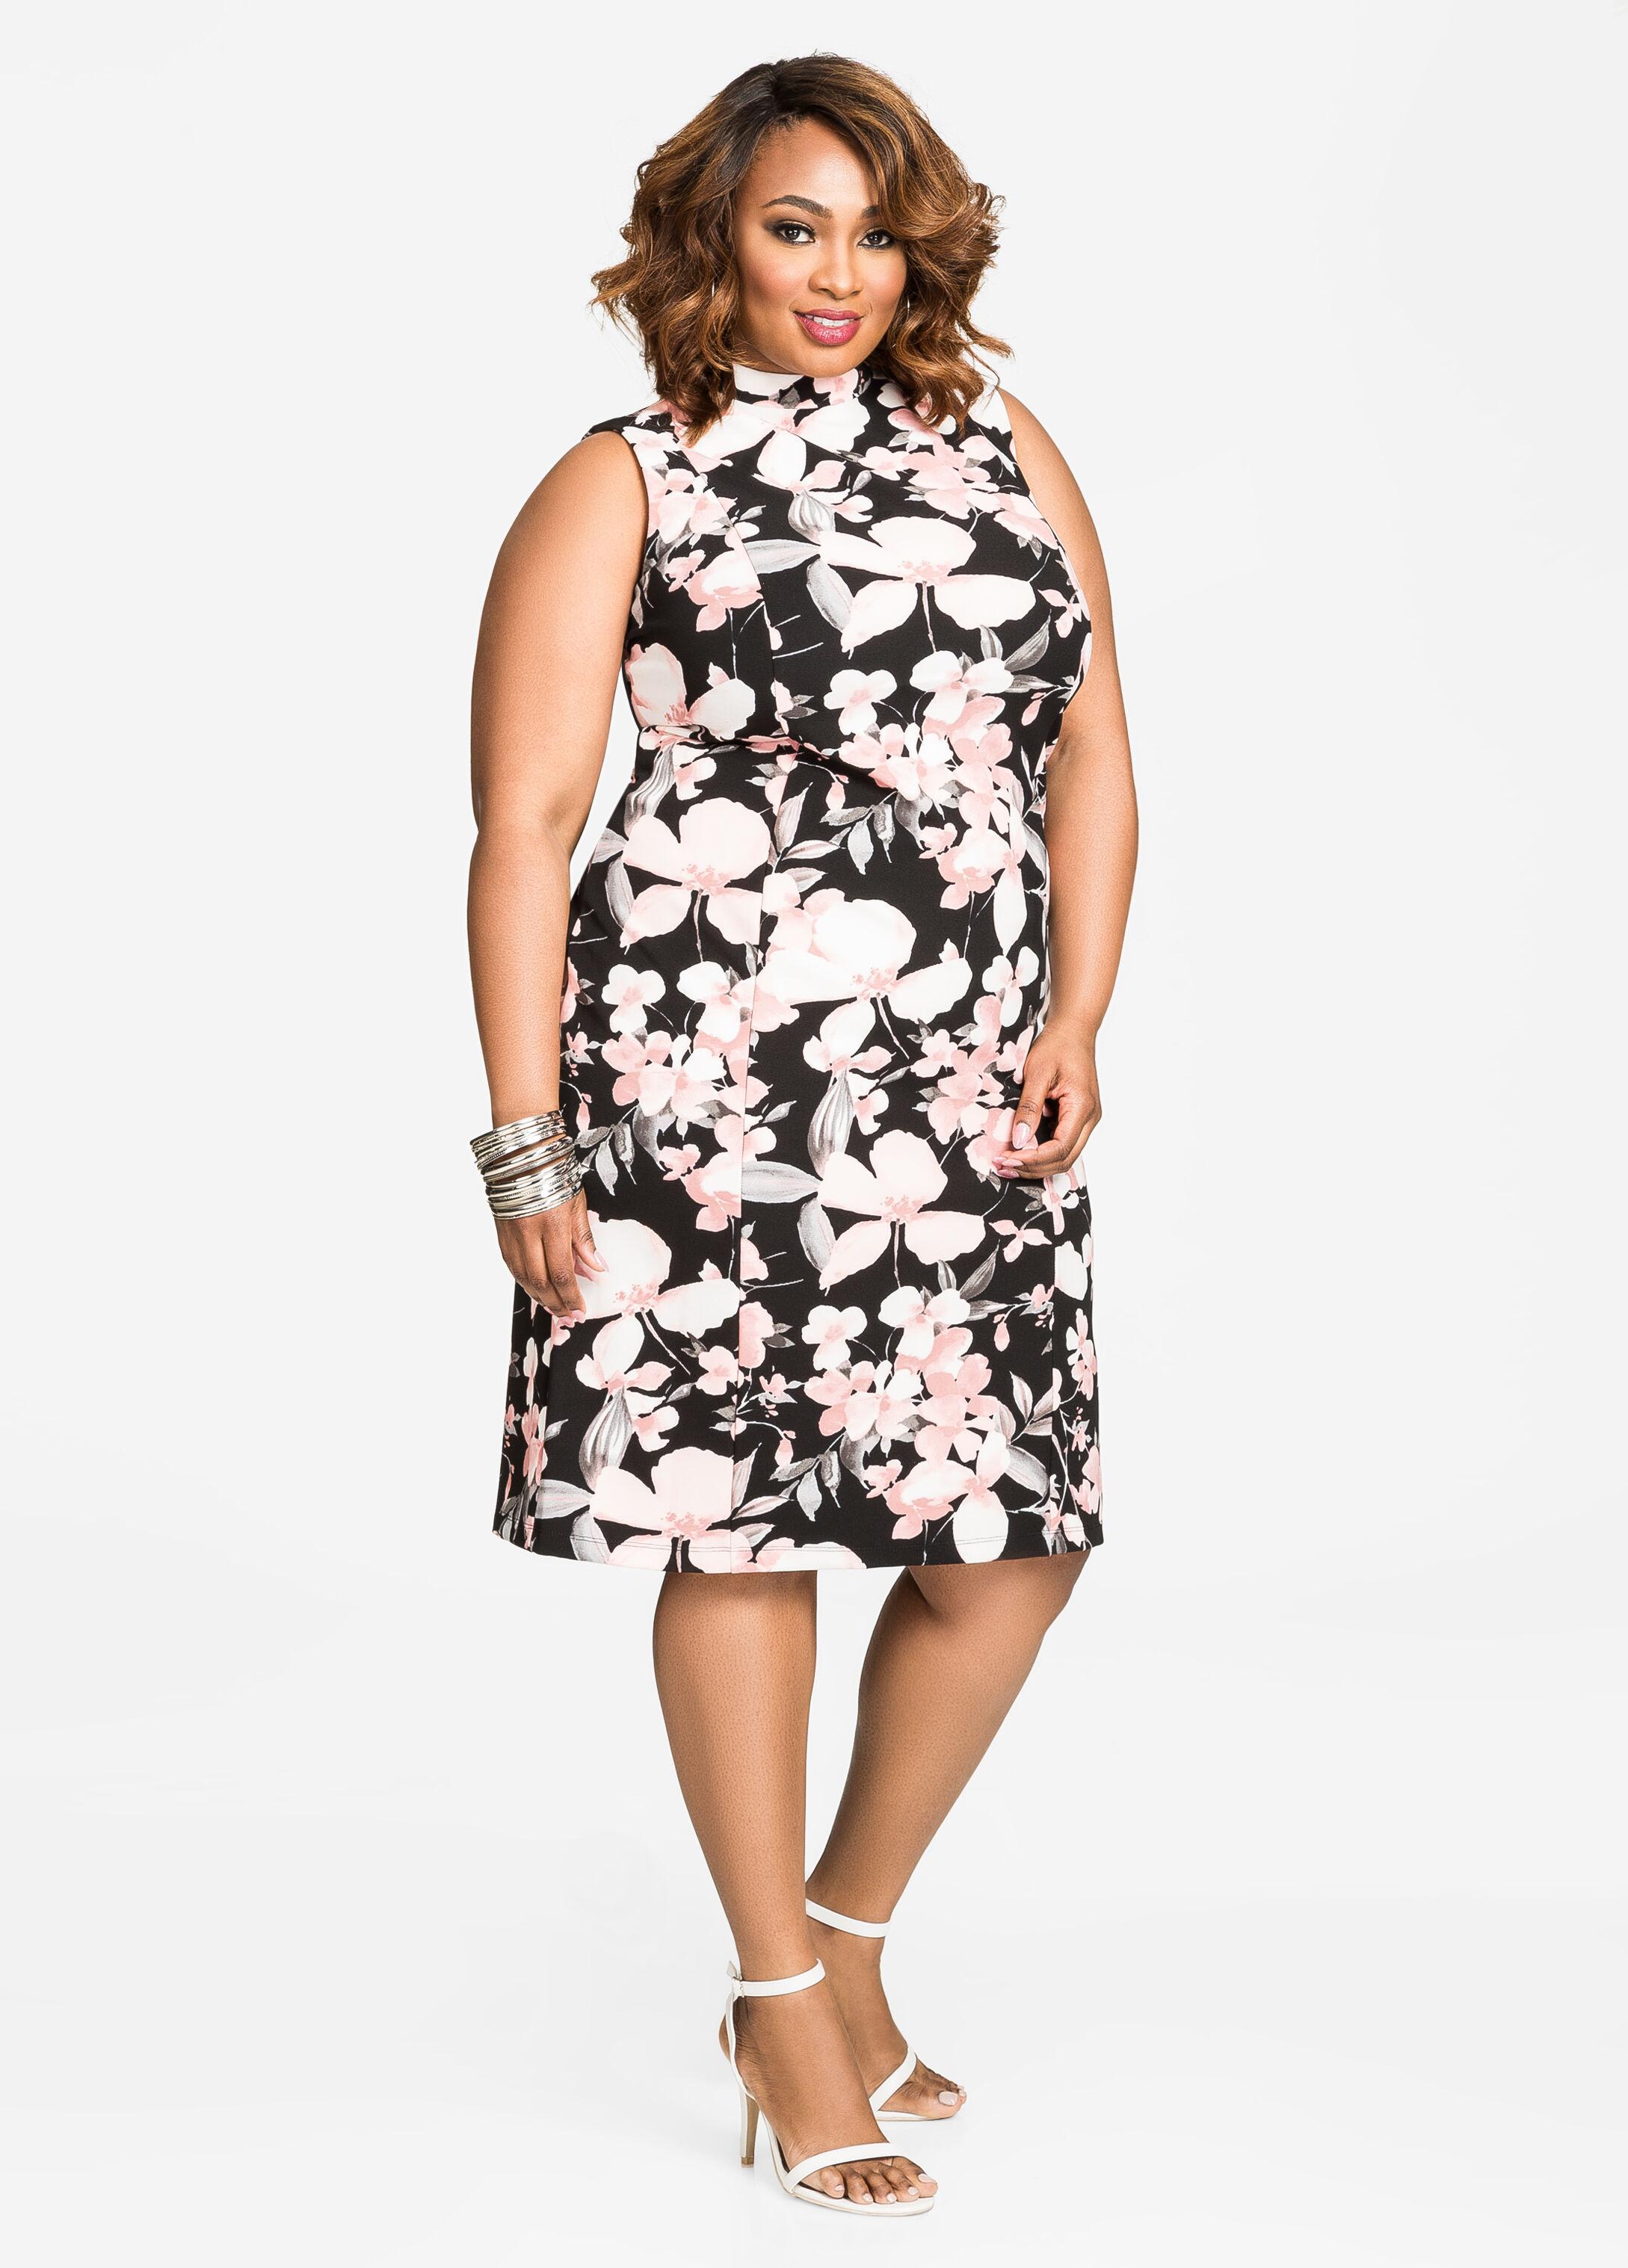 Buy Plus Size White Sheath Dress - Ashley Stewart